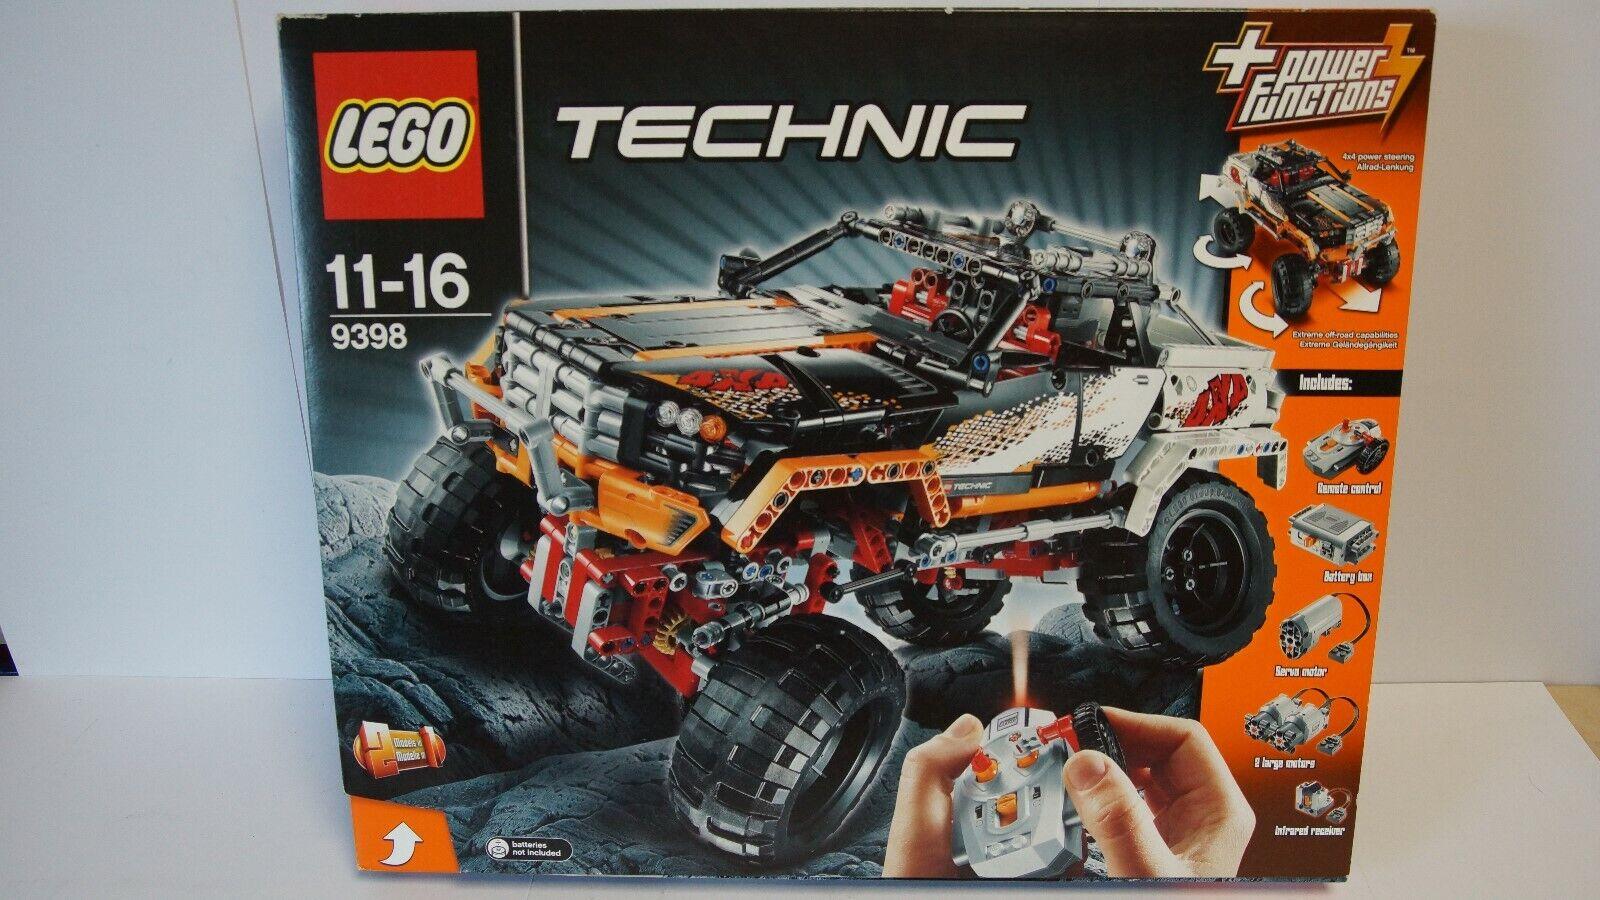 Lego 9398 - Technik - 4x4 Offroader - NEUWERTIG - in OVP